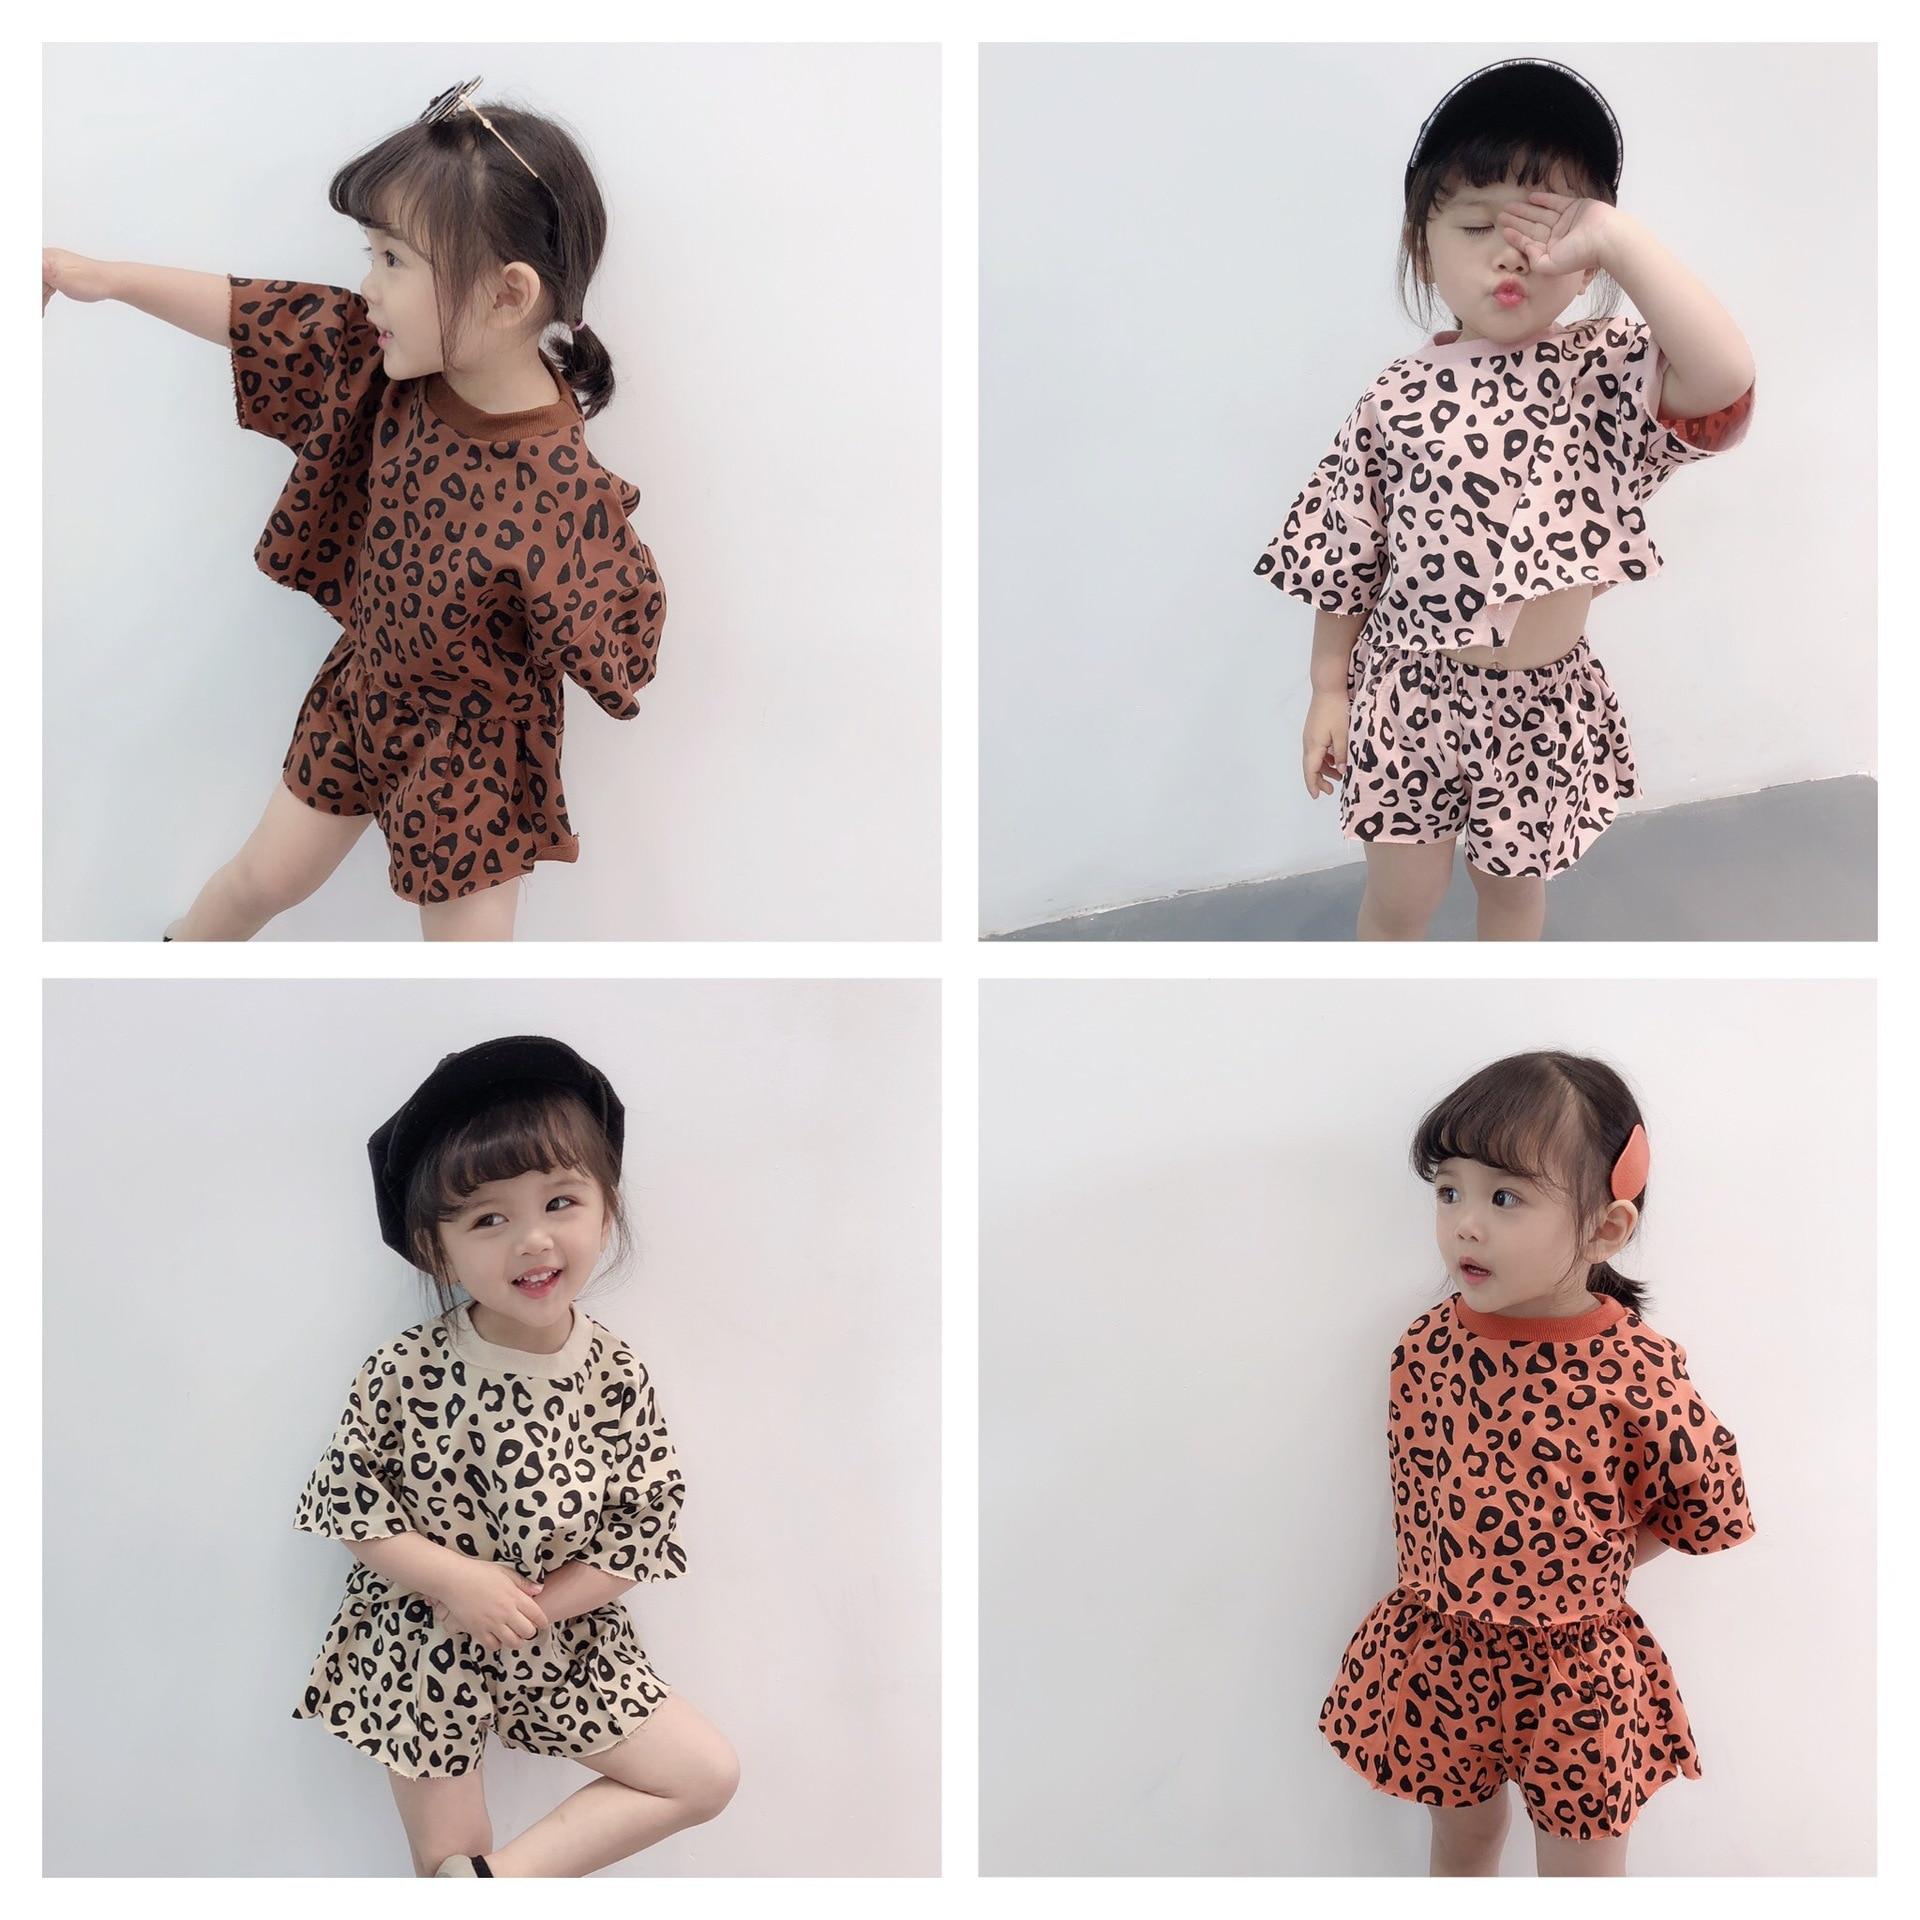 Baby Girl Tees Tops T-Shirt Vest Leopard Floral Tee Dress Skirt Outfits Set for Little Girl Sundresses